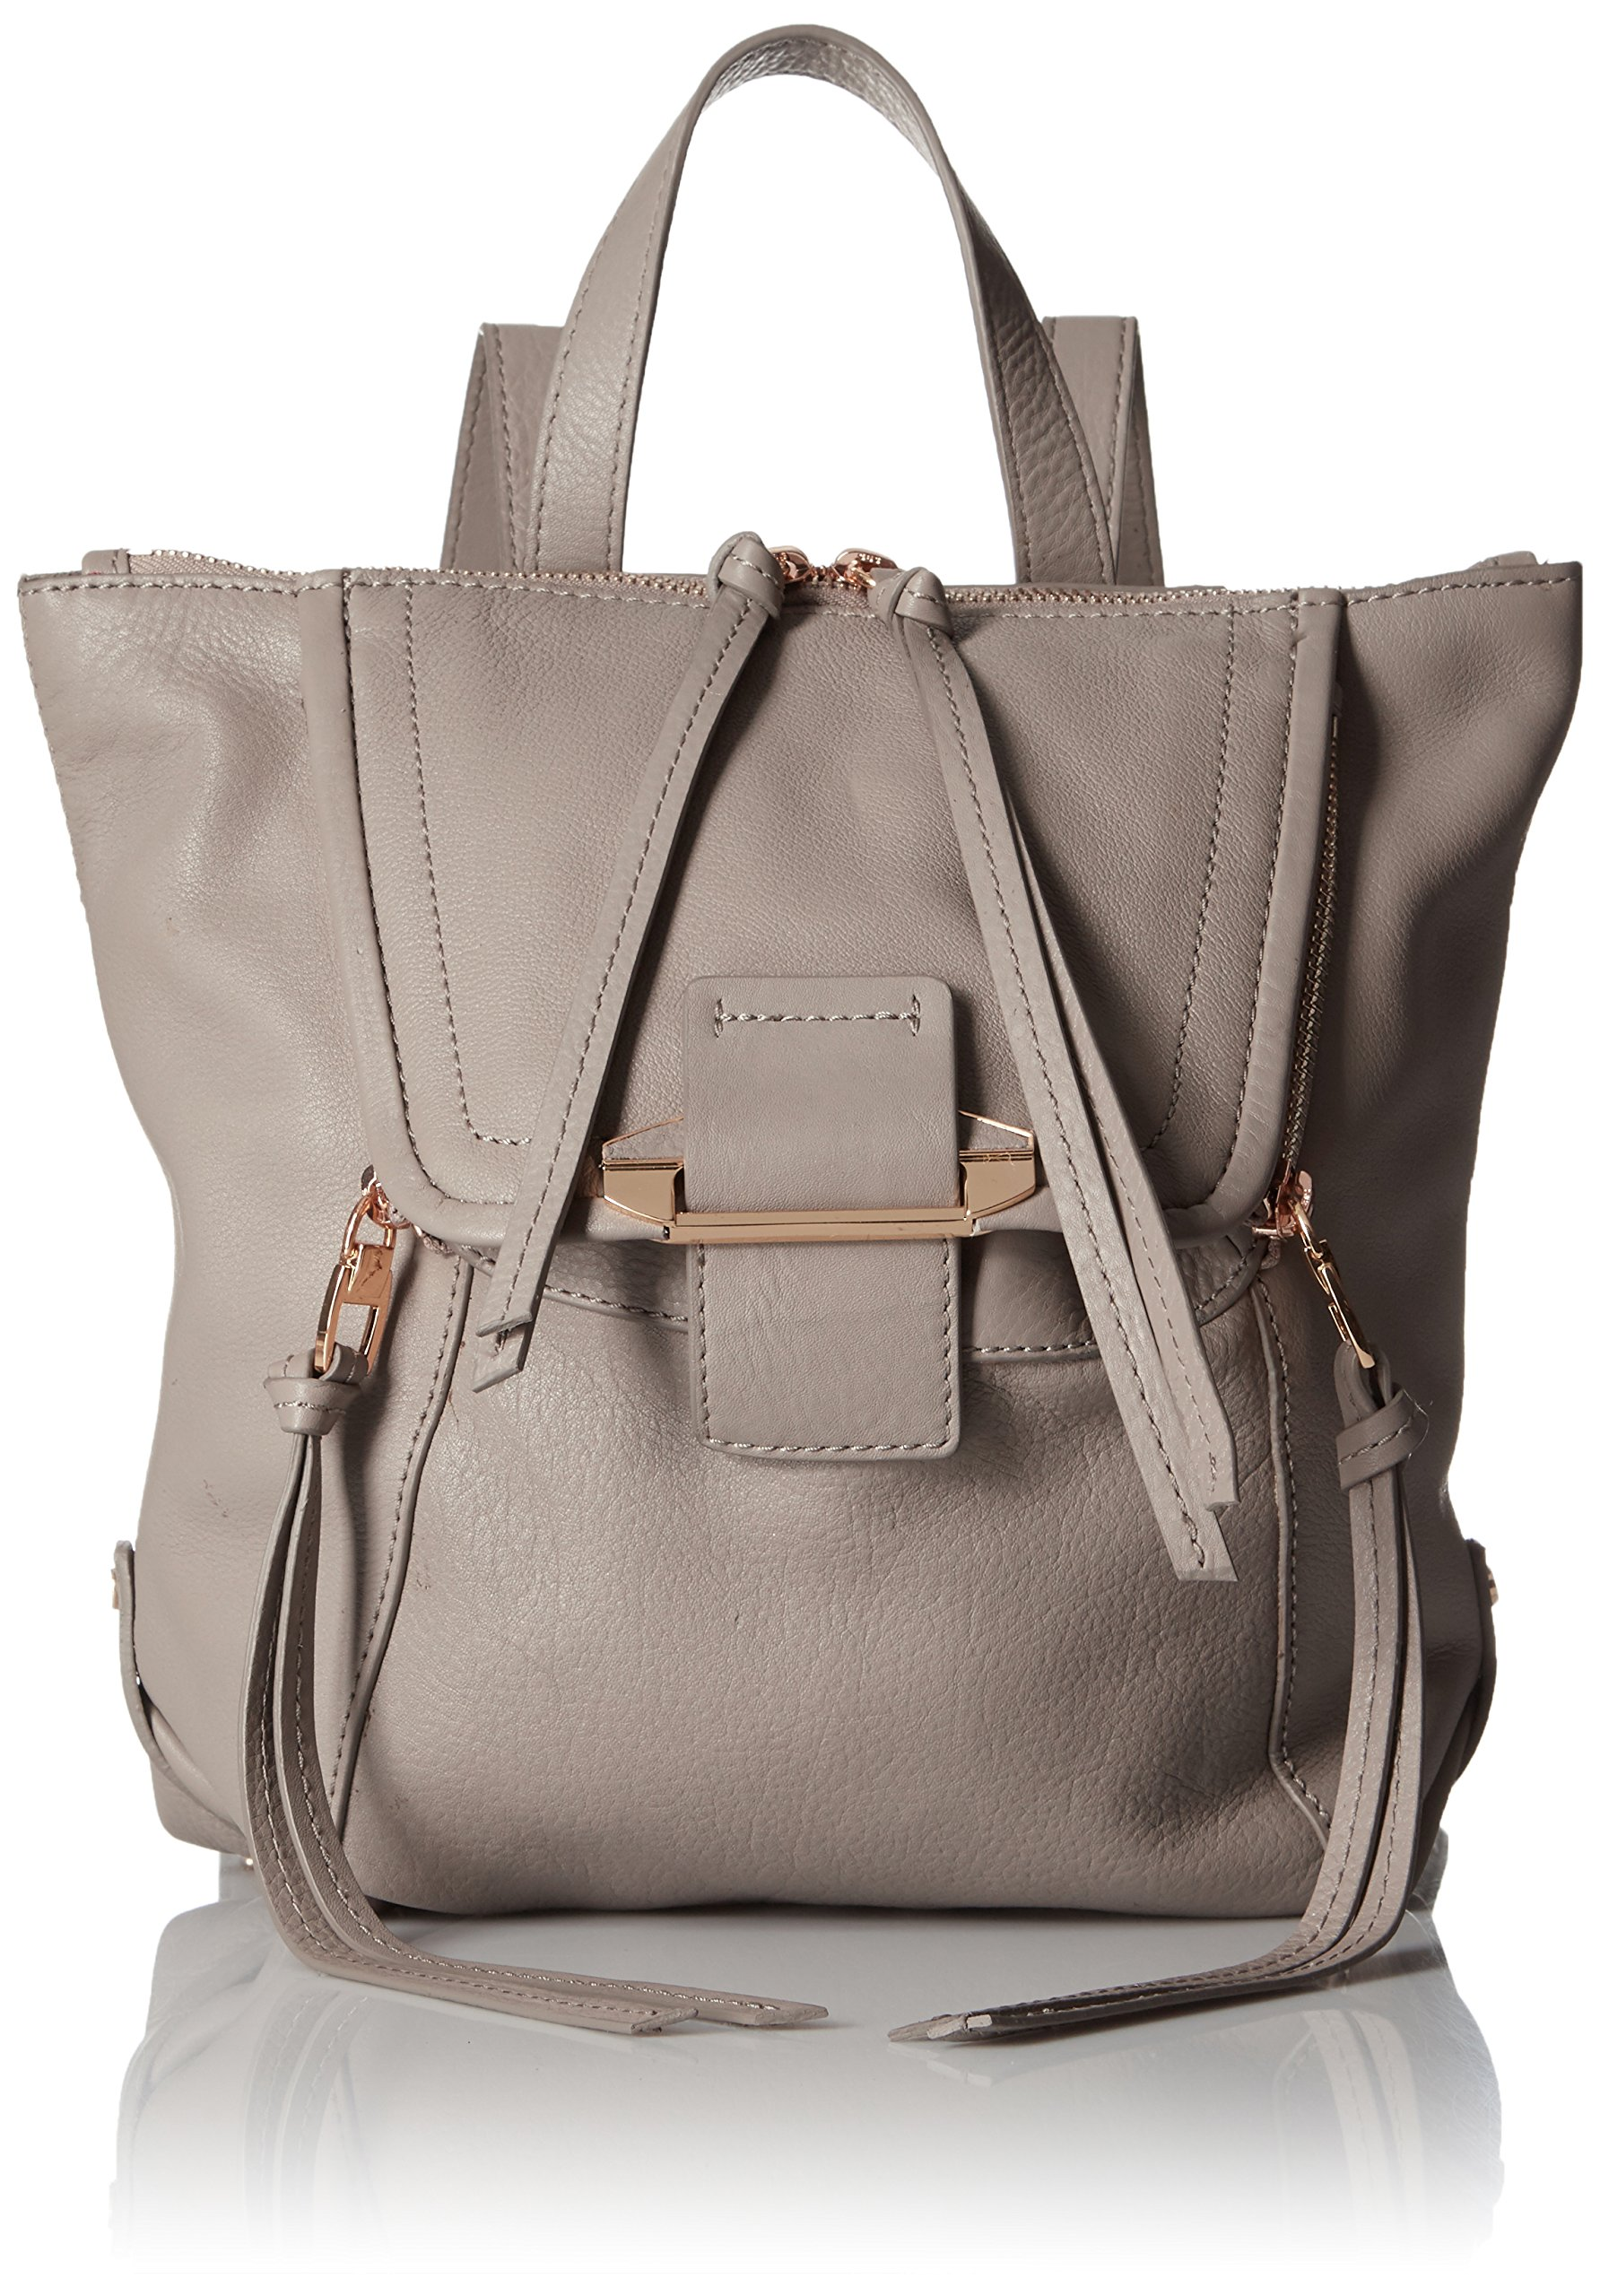 Kooba Handbags Bobbi Mini Backpack, Concrete